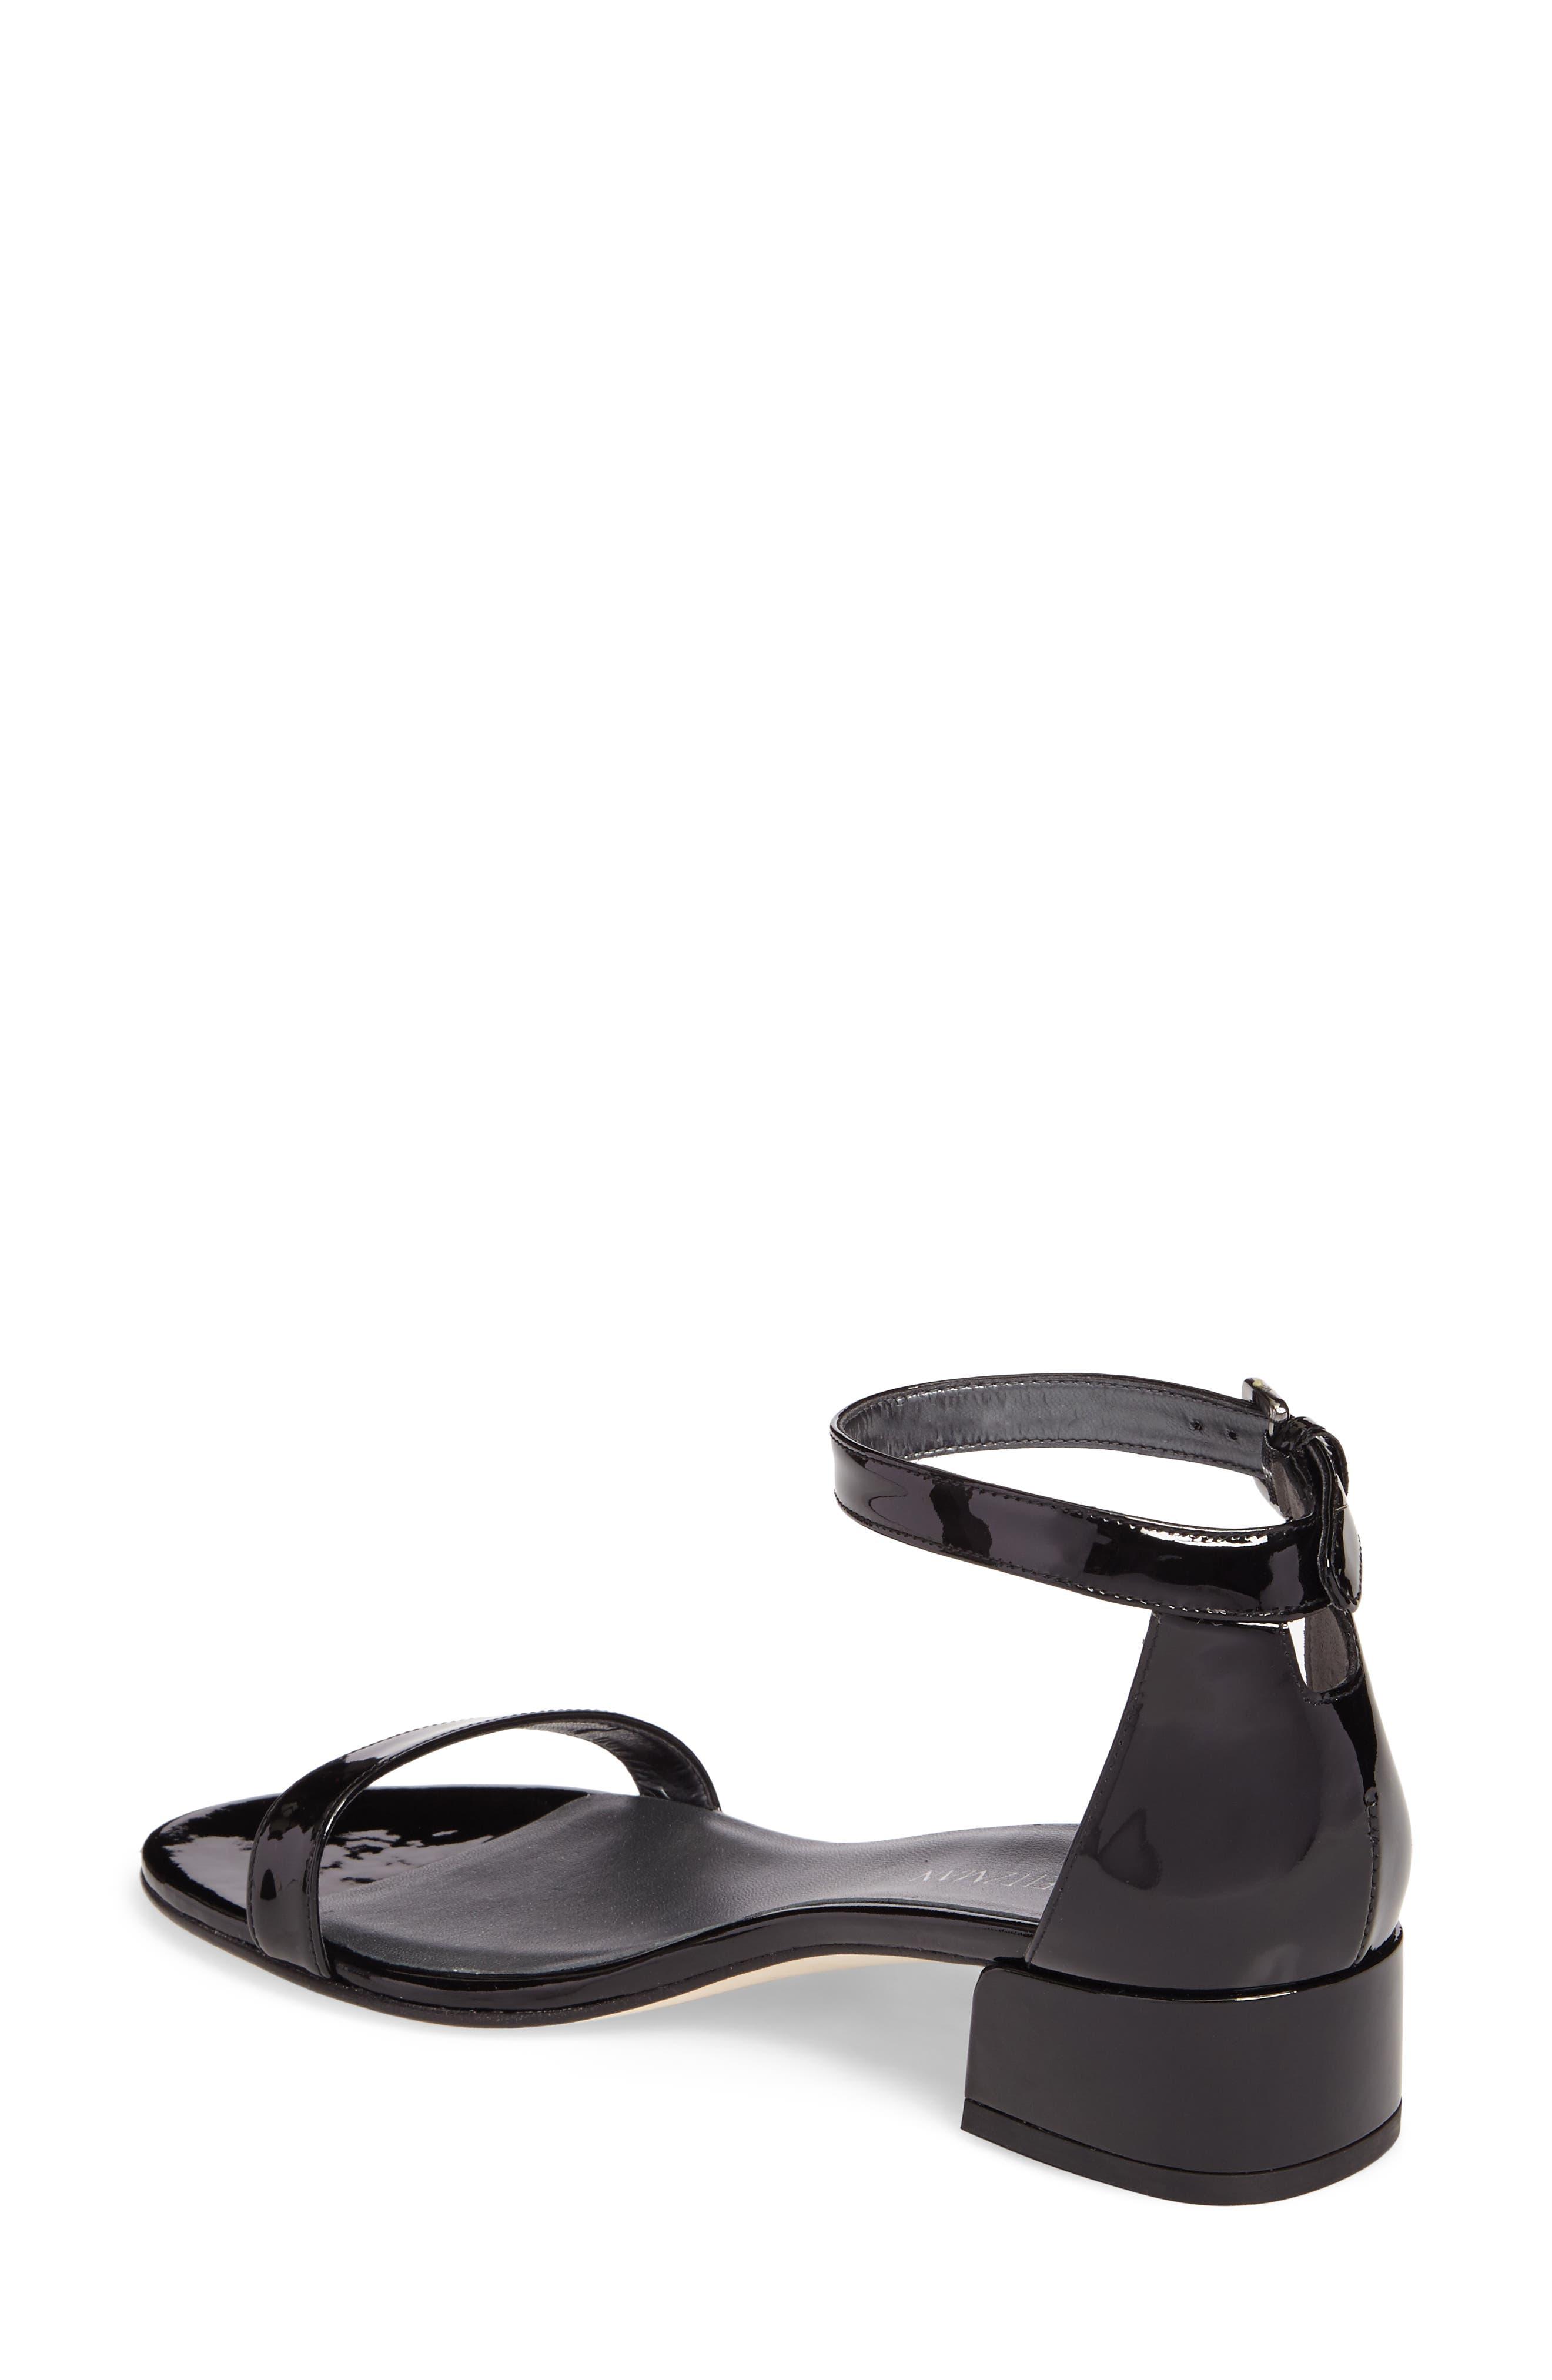 NudistJune Block Heel Sandal,                             Alternate thumbnail 2, color,                             Black Patent